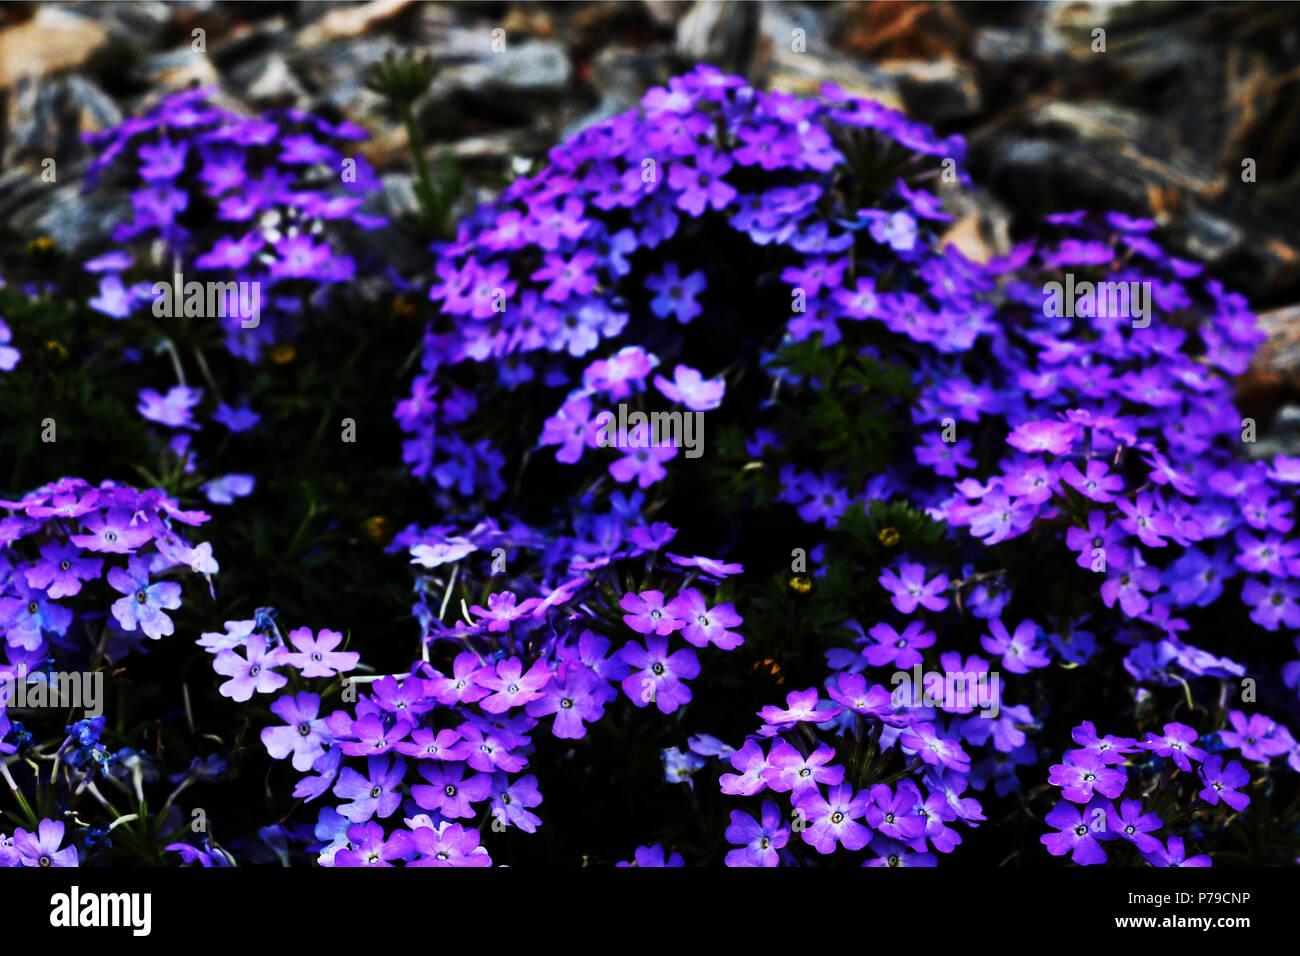 Big Bush Of Bright Blue Flowers Background Stock Photo 211034594